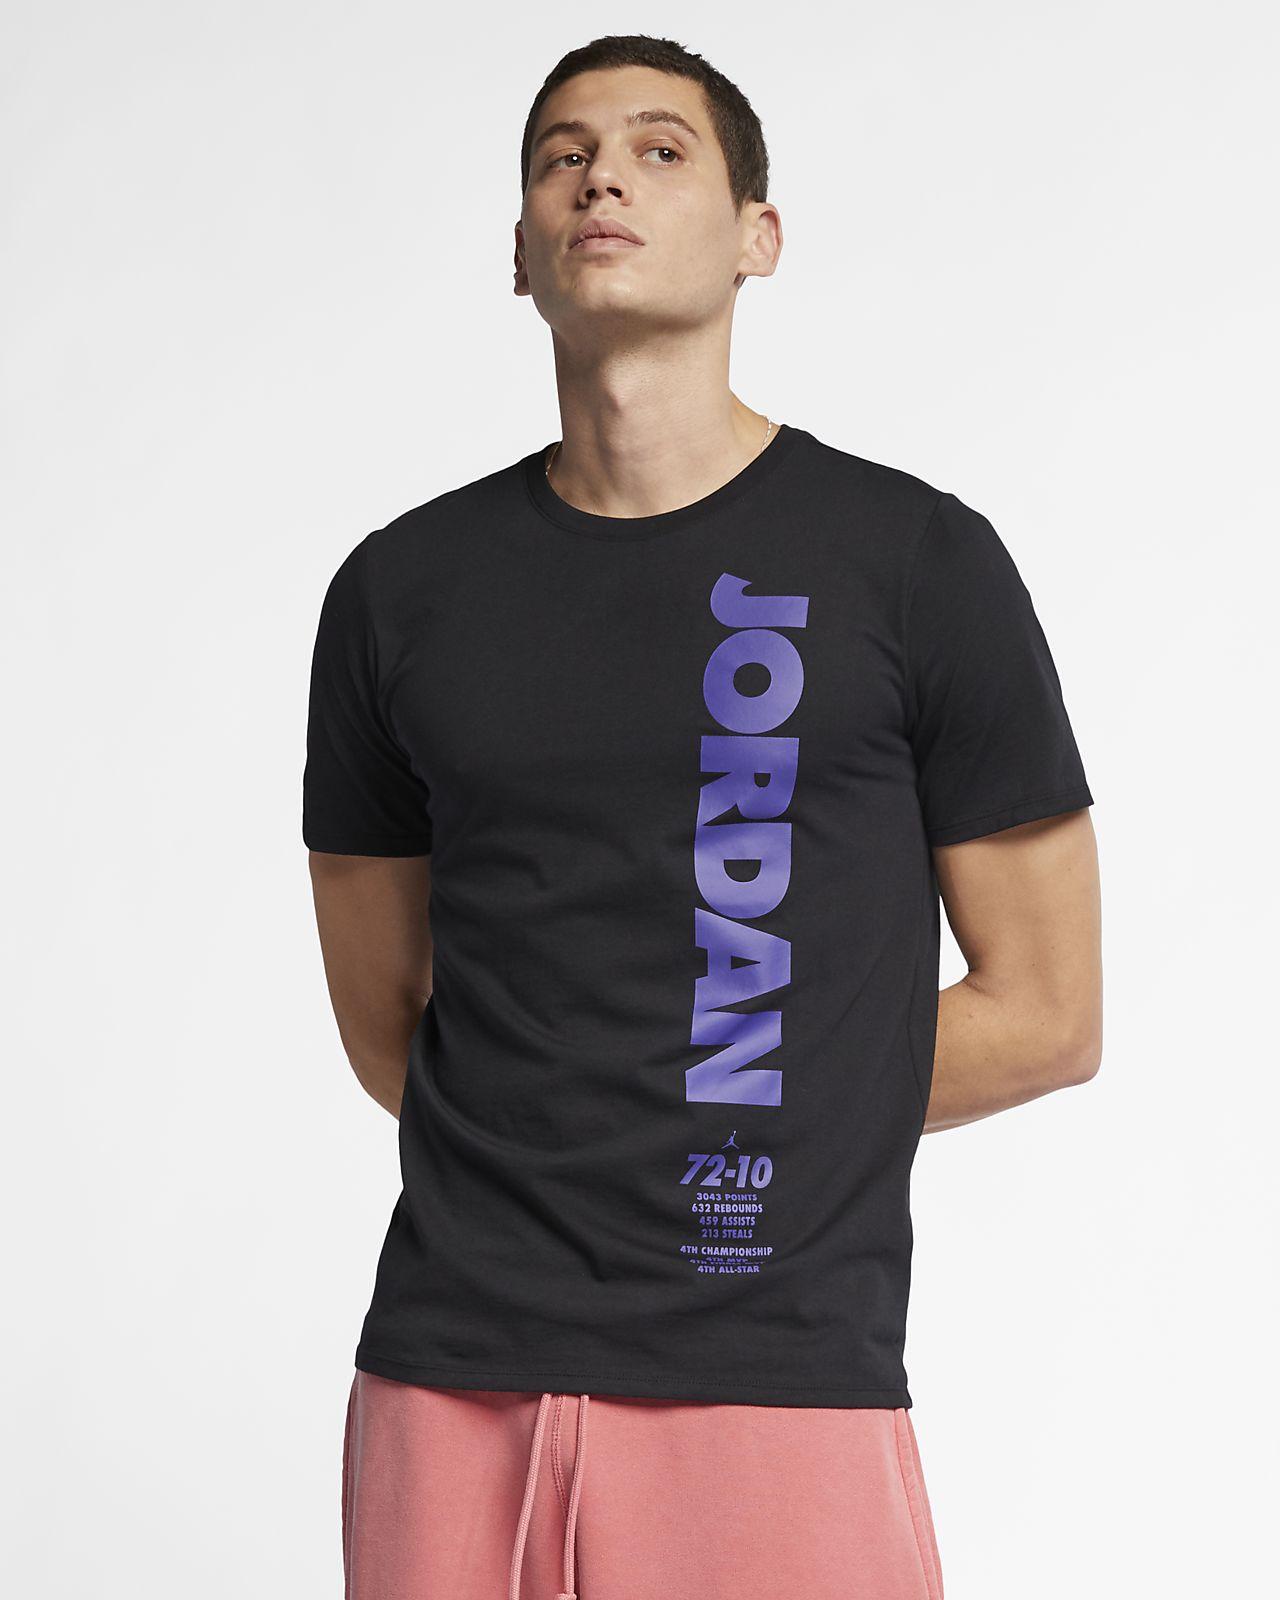 new product d12b8 e81ee Men s T-Shirt. Jordan Sportswear Legacy AJ 11